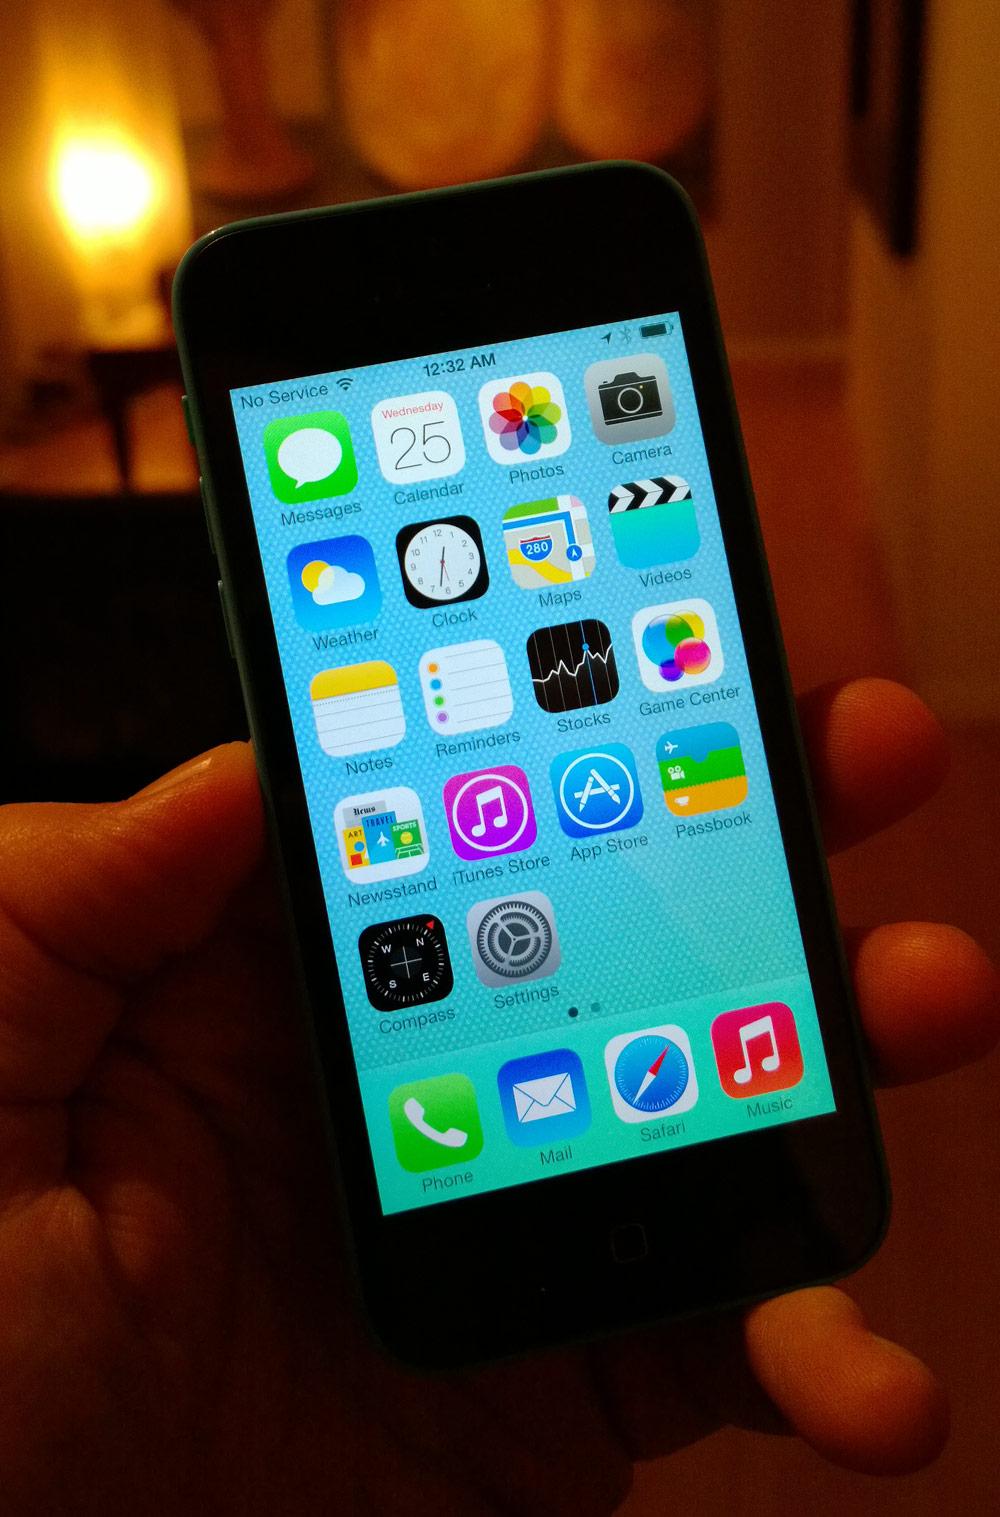 iPhone 4 in iPhone 5 case